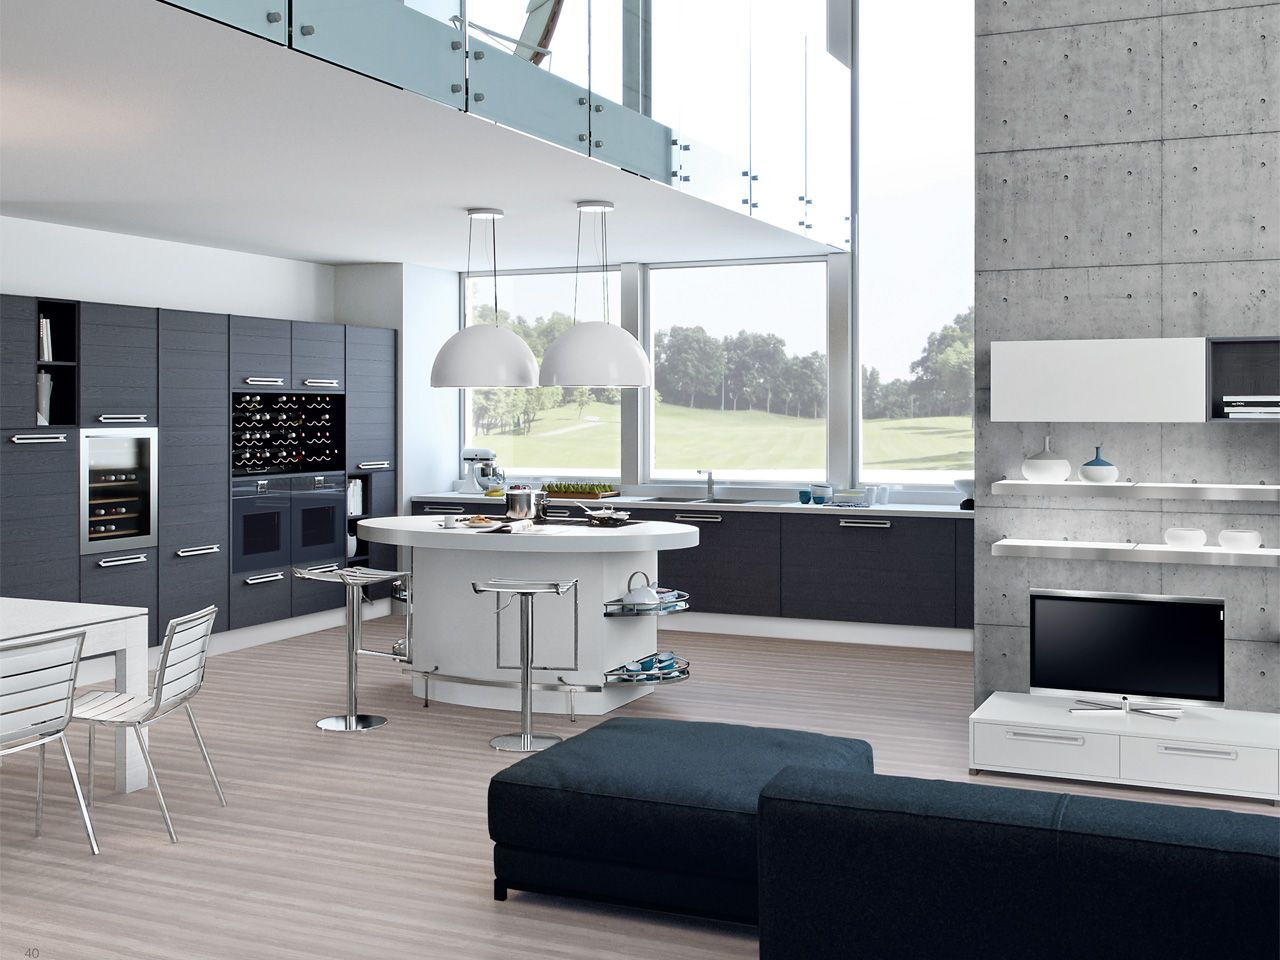 ADELE Project - Cucina Lube Moderna | ADELE PROJECT / Cucine Lube ...